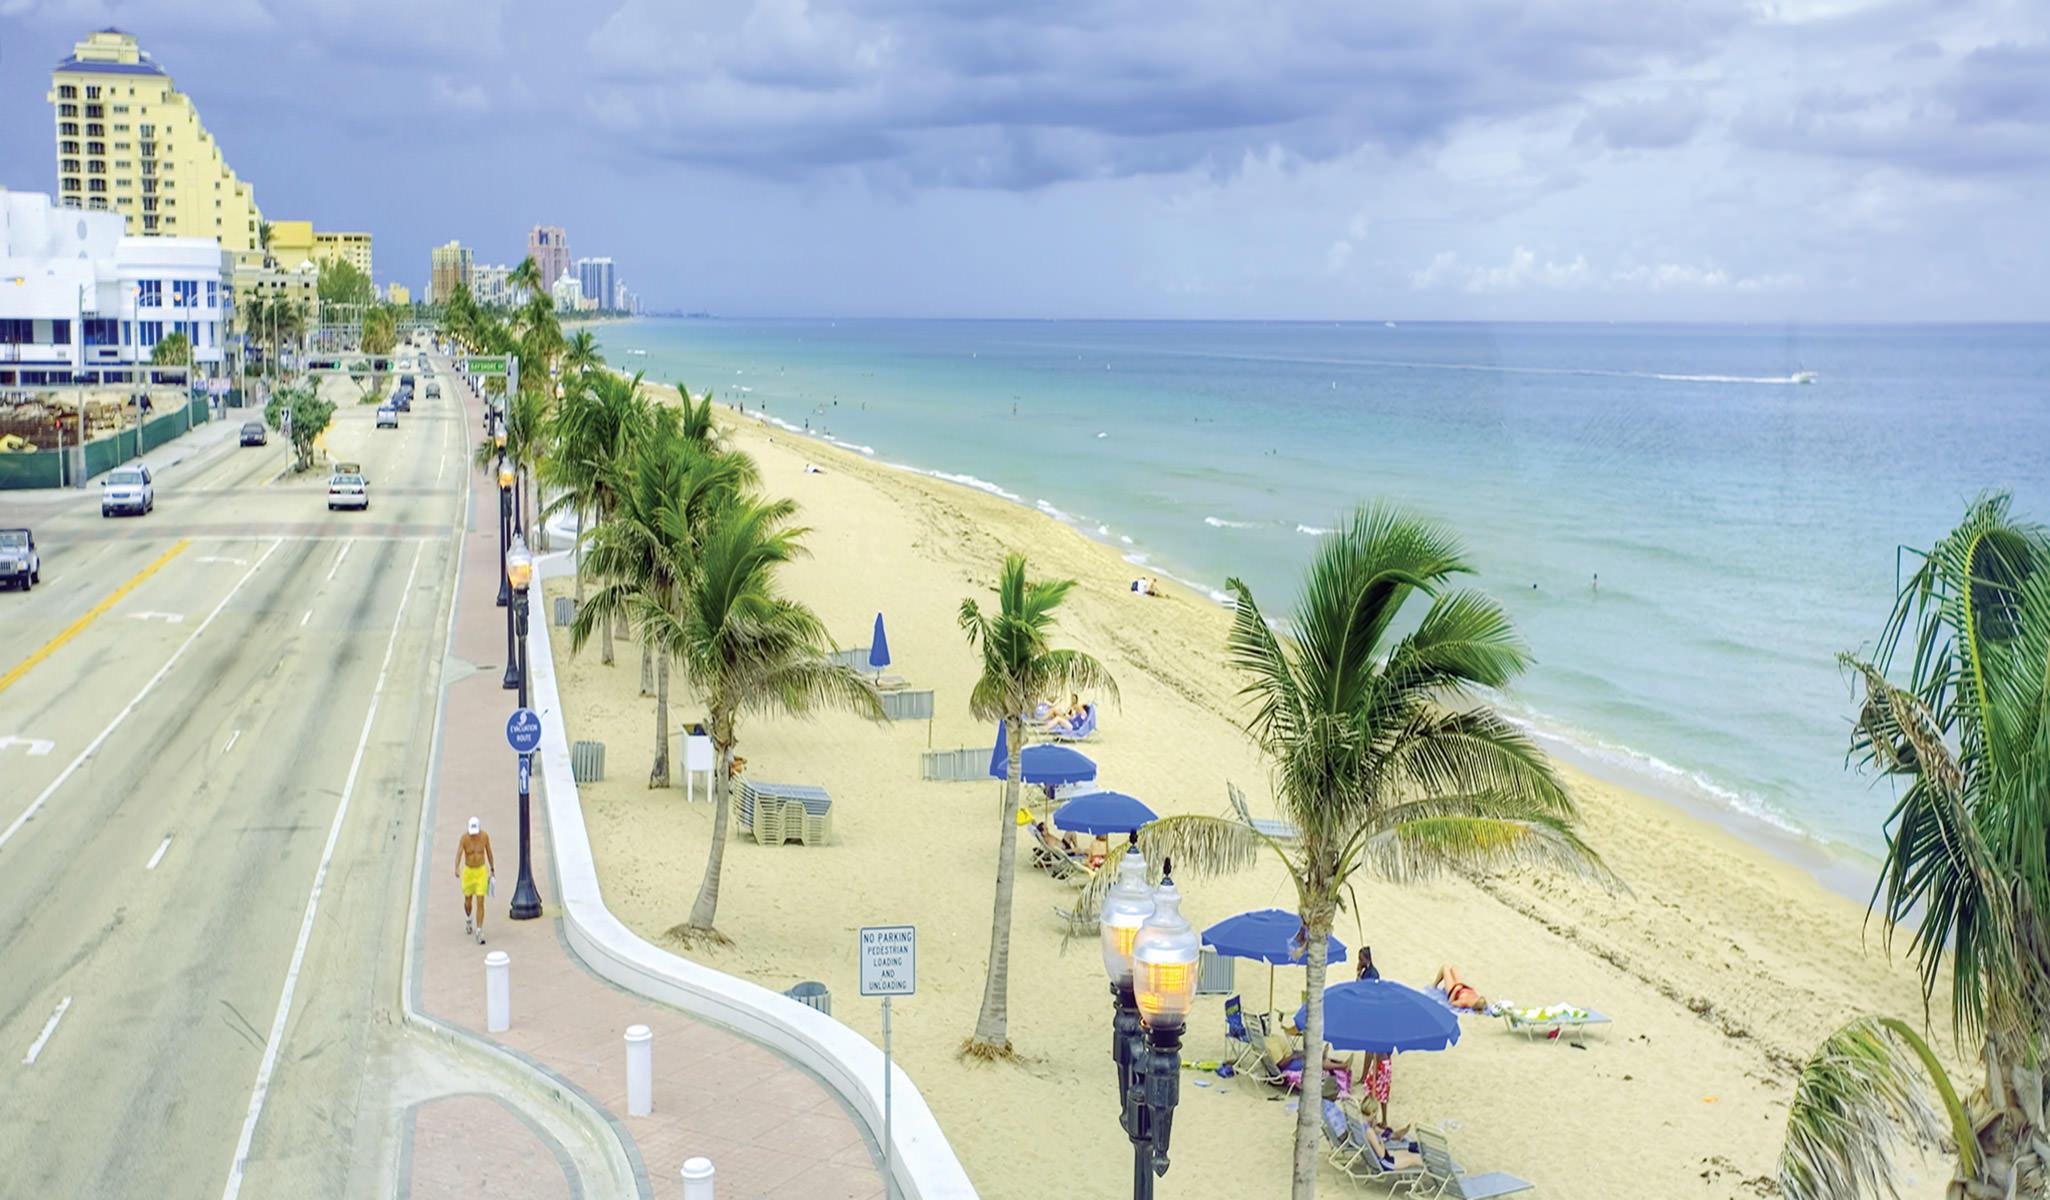 Vols Vers Fort Lauderdale Air Transat